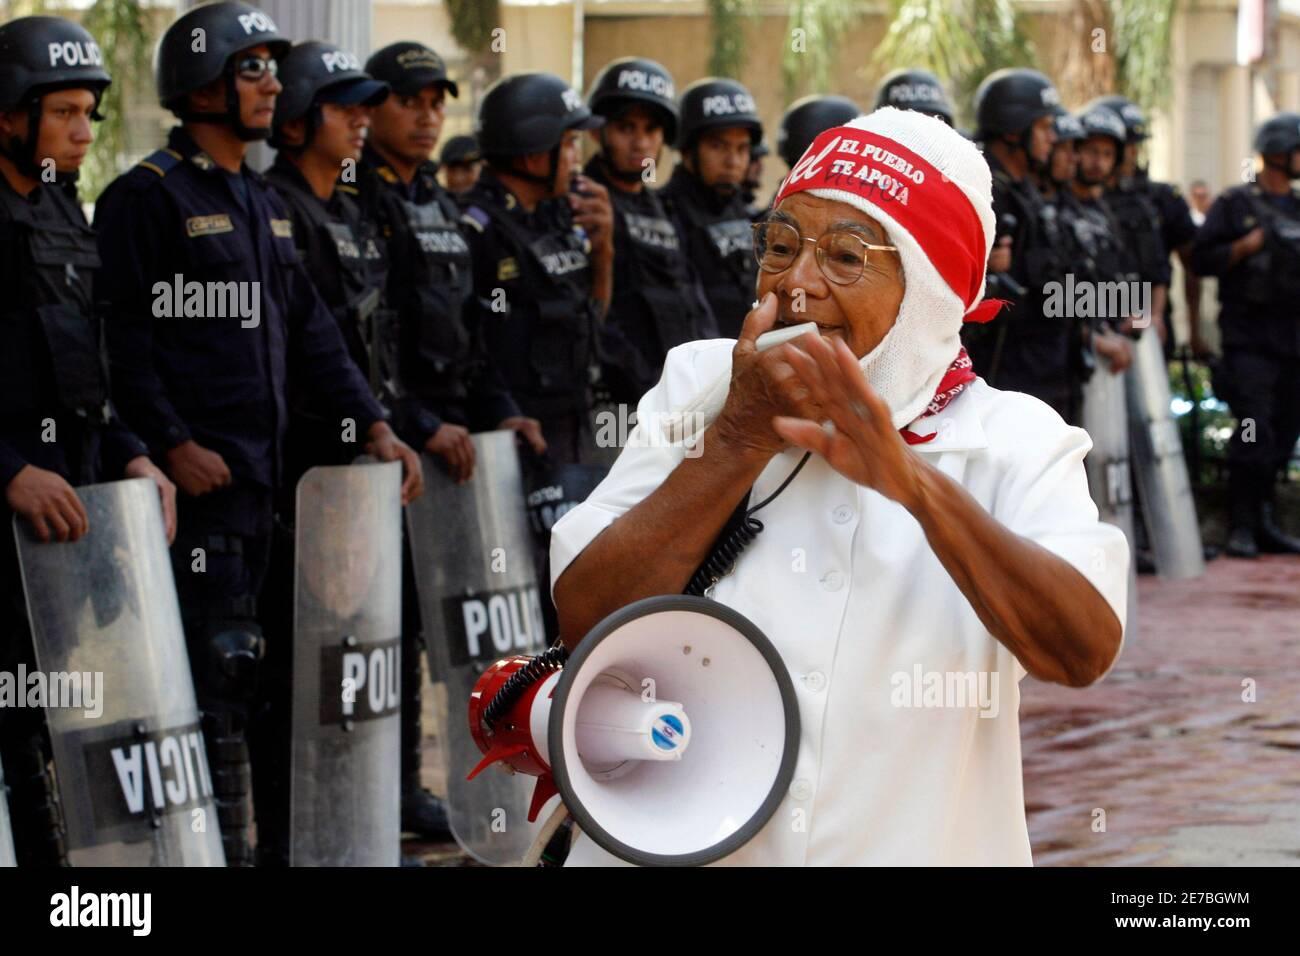 A supporter of Honduras' ousted President Manuel Zelaya shouts slogans against Honduras' de facto leader Roberto Micheletti  during a protest outside the National Congress in Tegucigalpa November 2, 2009.  REUTERS/Oswaldo Rivas (HONDURAS POLITICS CONFLICT) Stock Photo